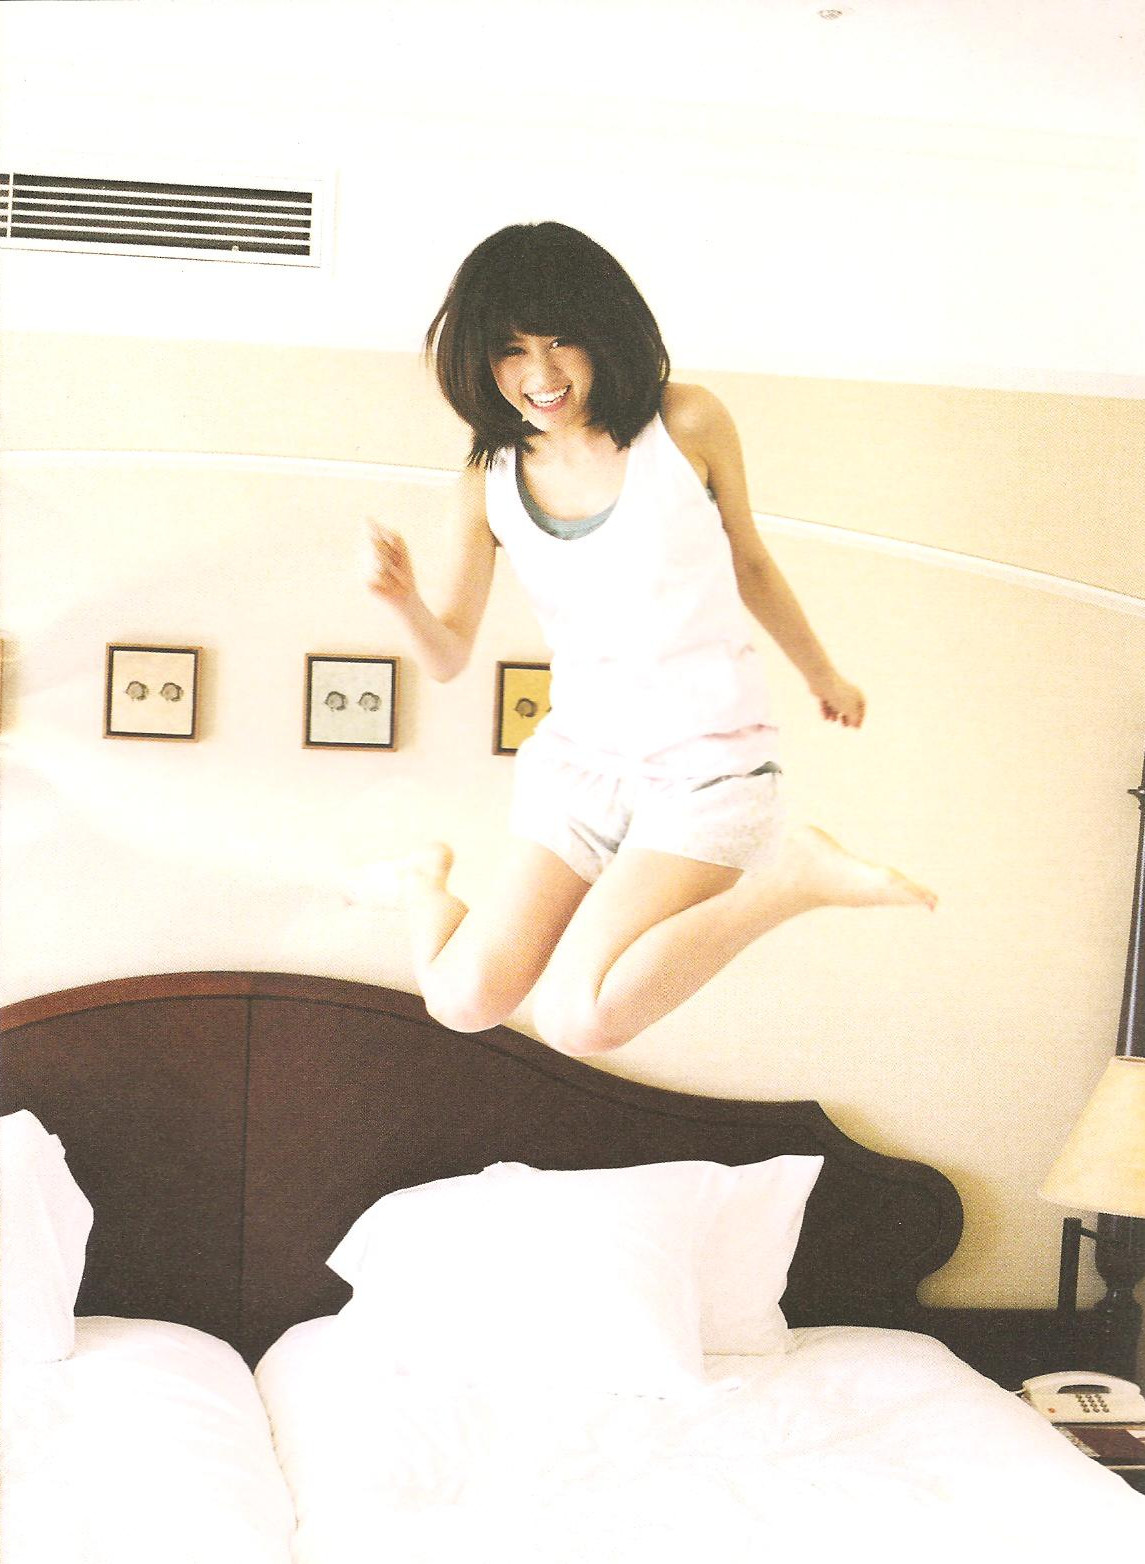 Maeda Atsuko photobook Bukiyo - AKB48 Photo (38227532